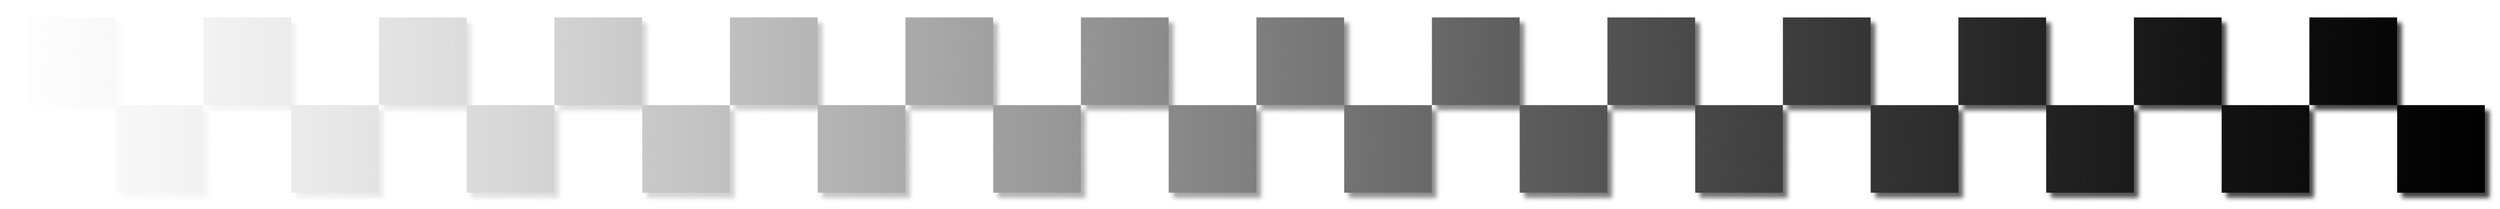 fade to black checker.jpg